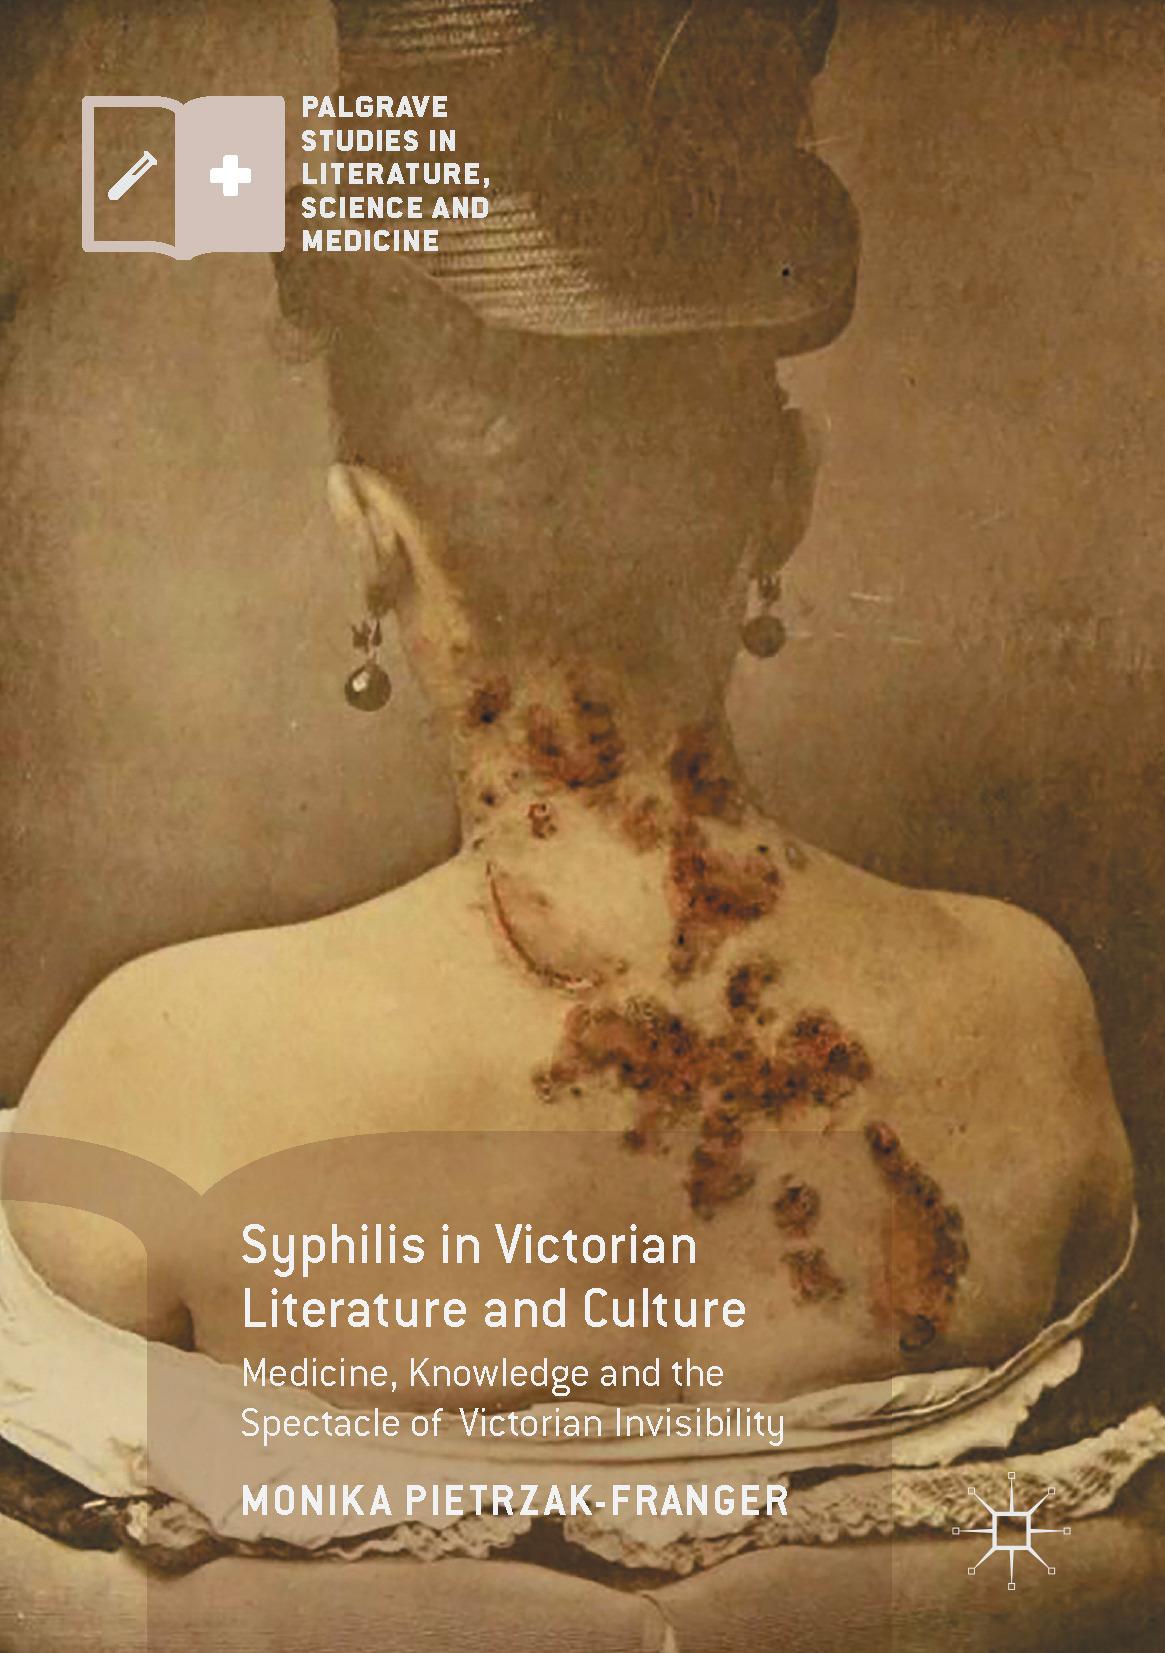 Pietrzak-Franger, Monika - Syphilis in Victorian Literature and Culture, ebook